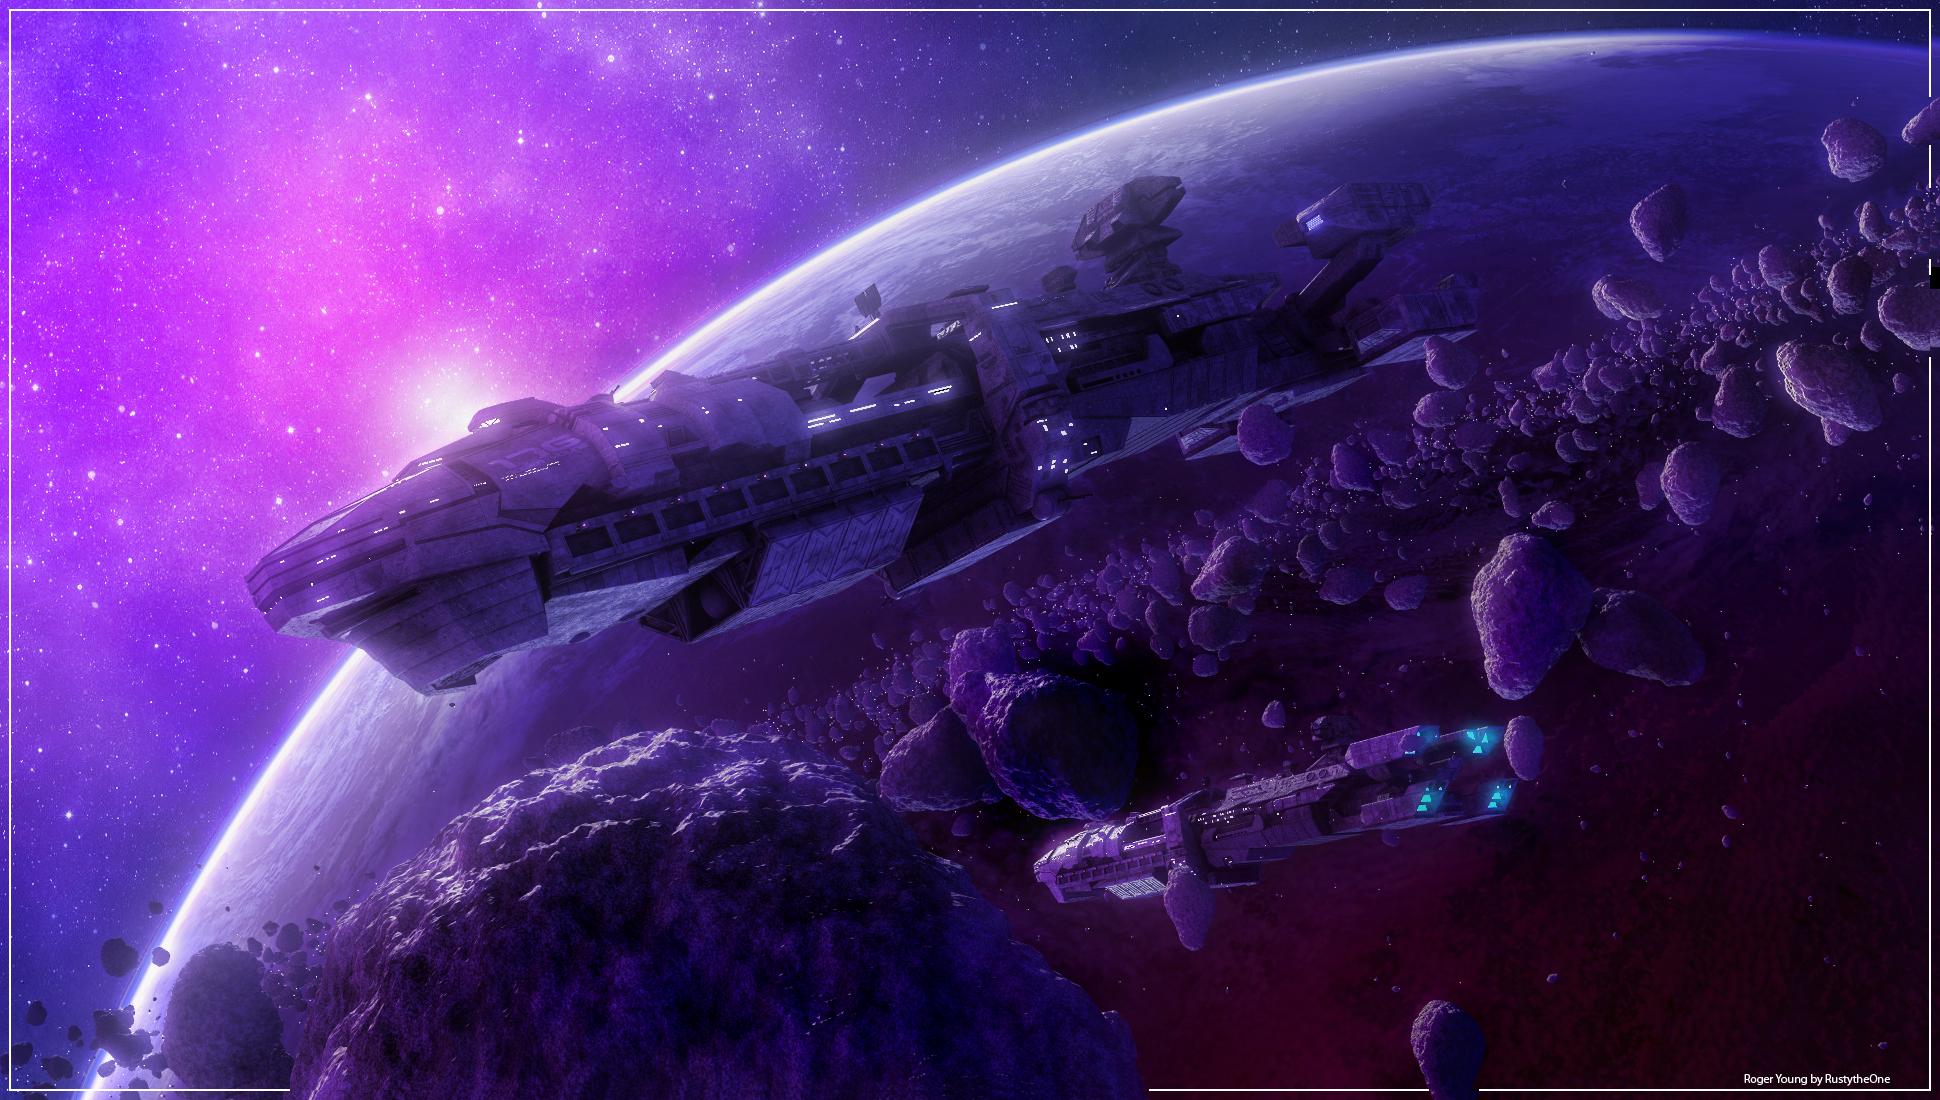 Patrolling Planet Z by GrahamTG